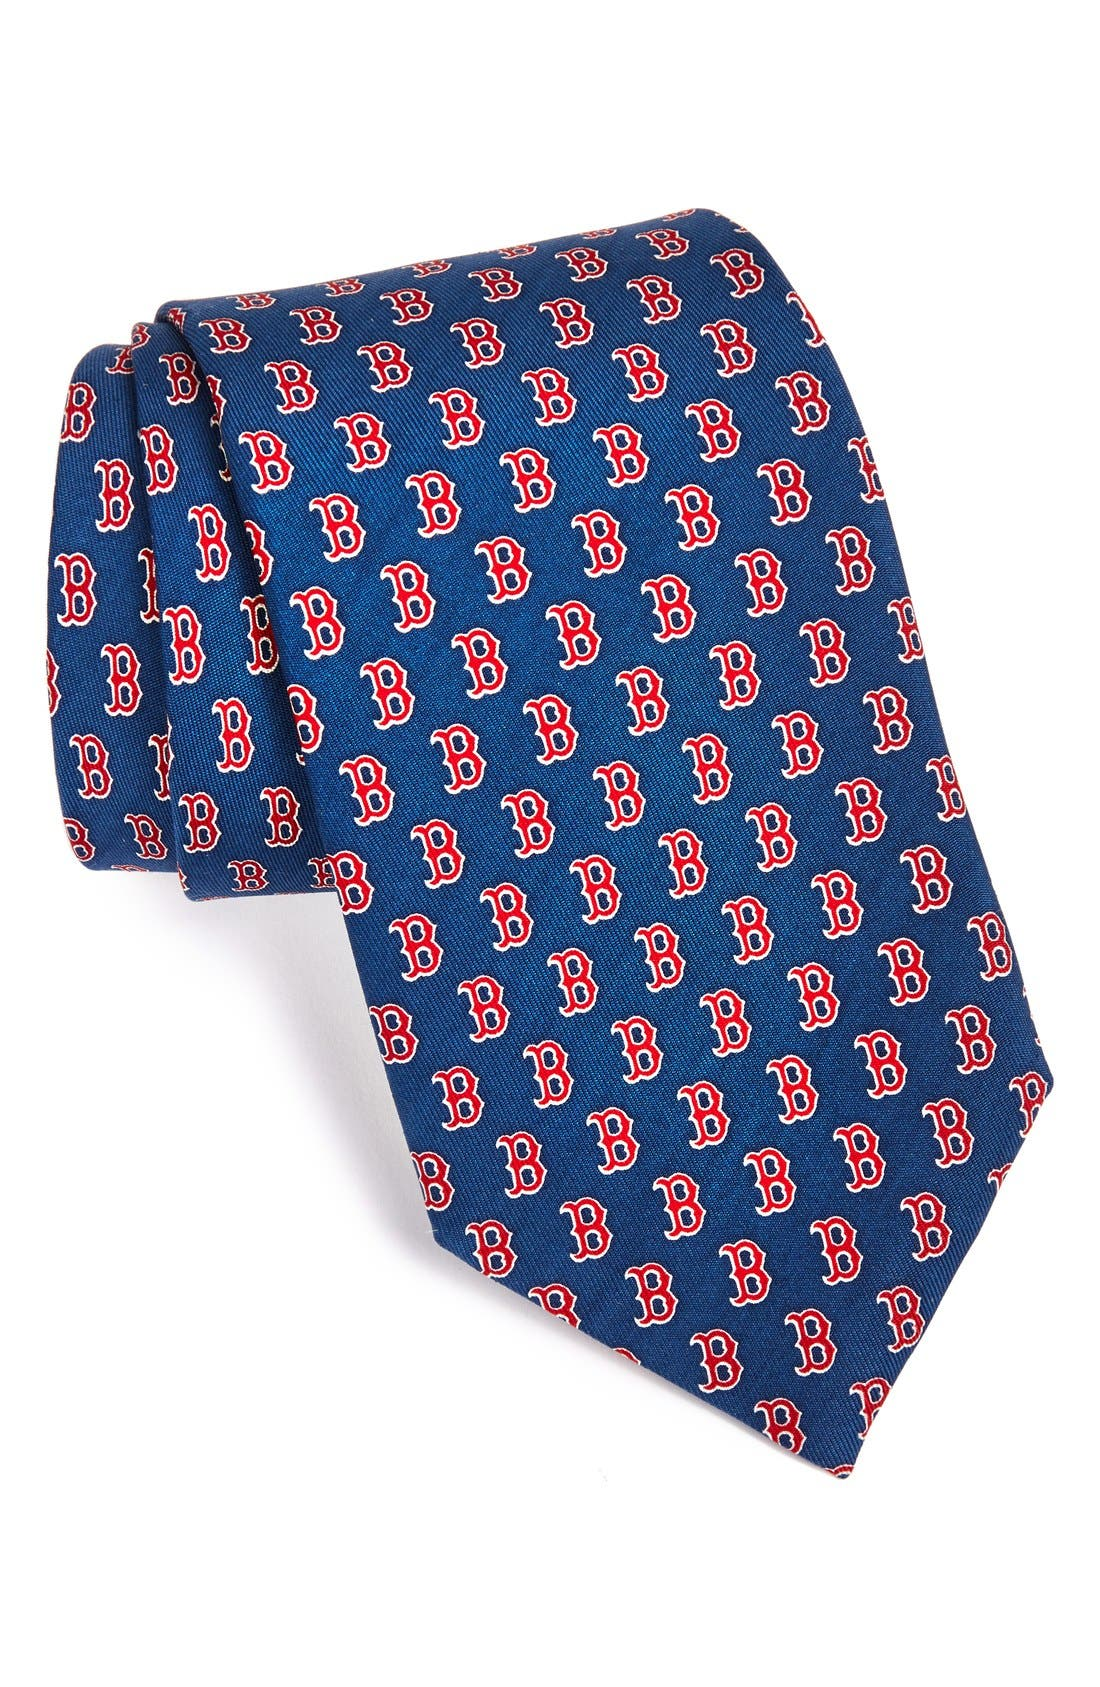 VINEYARD VINES,                             Boston Red Sox Silk Tie,                             Main thumbnail 1, color,                             414